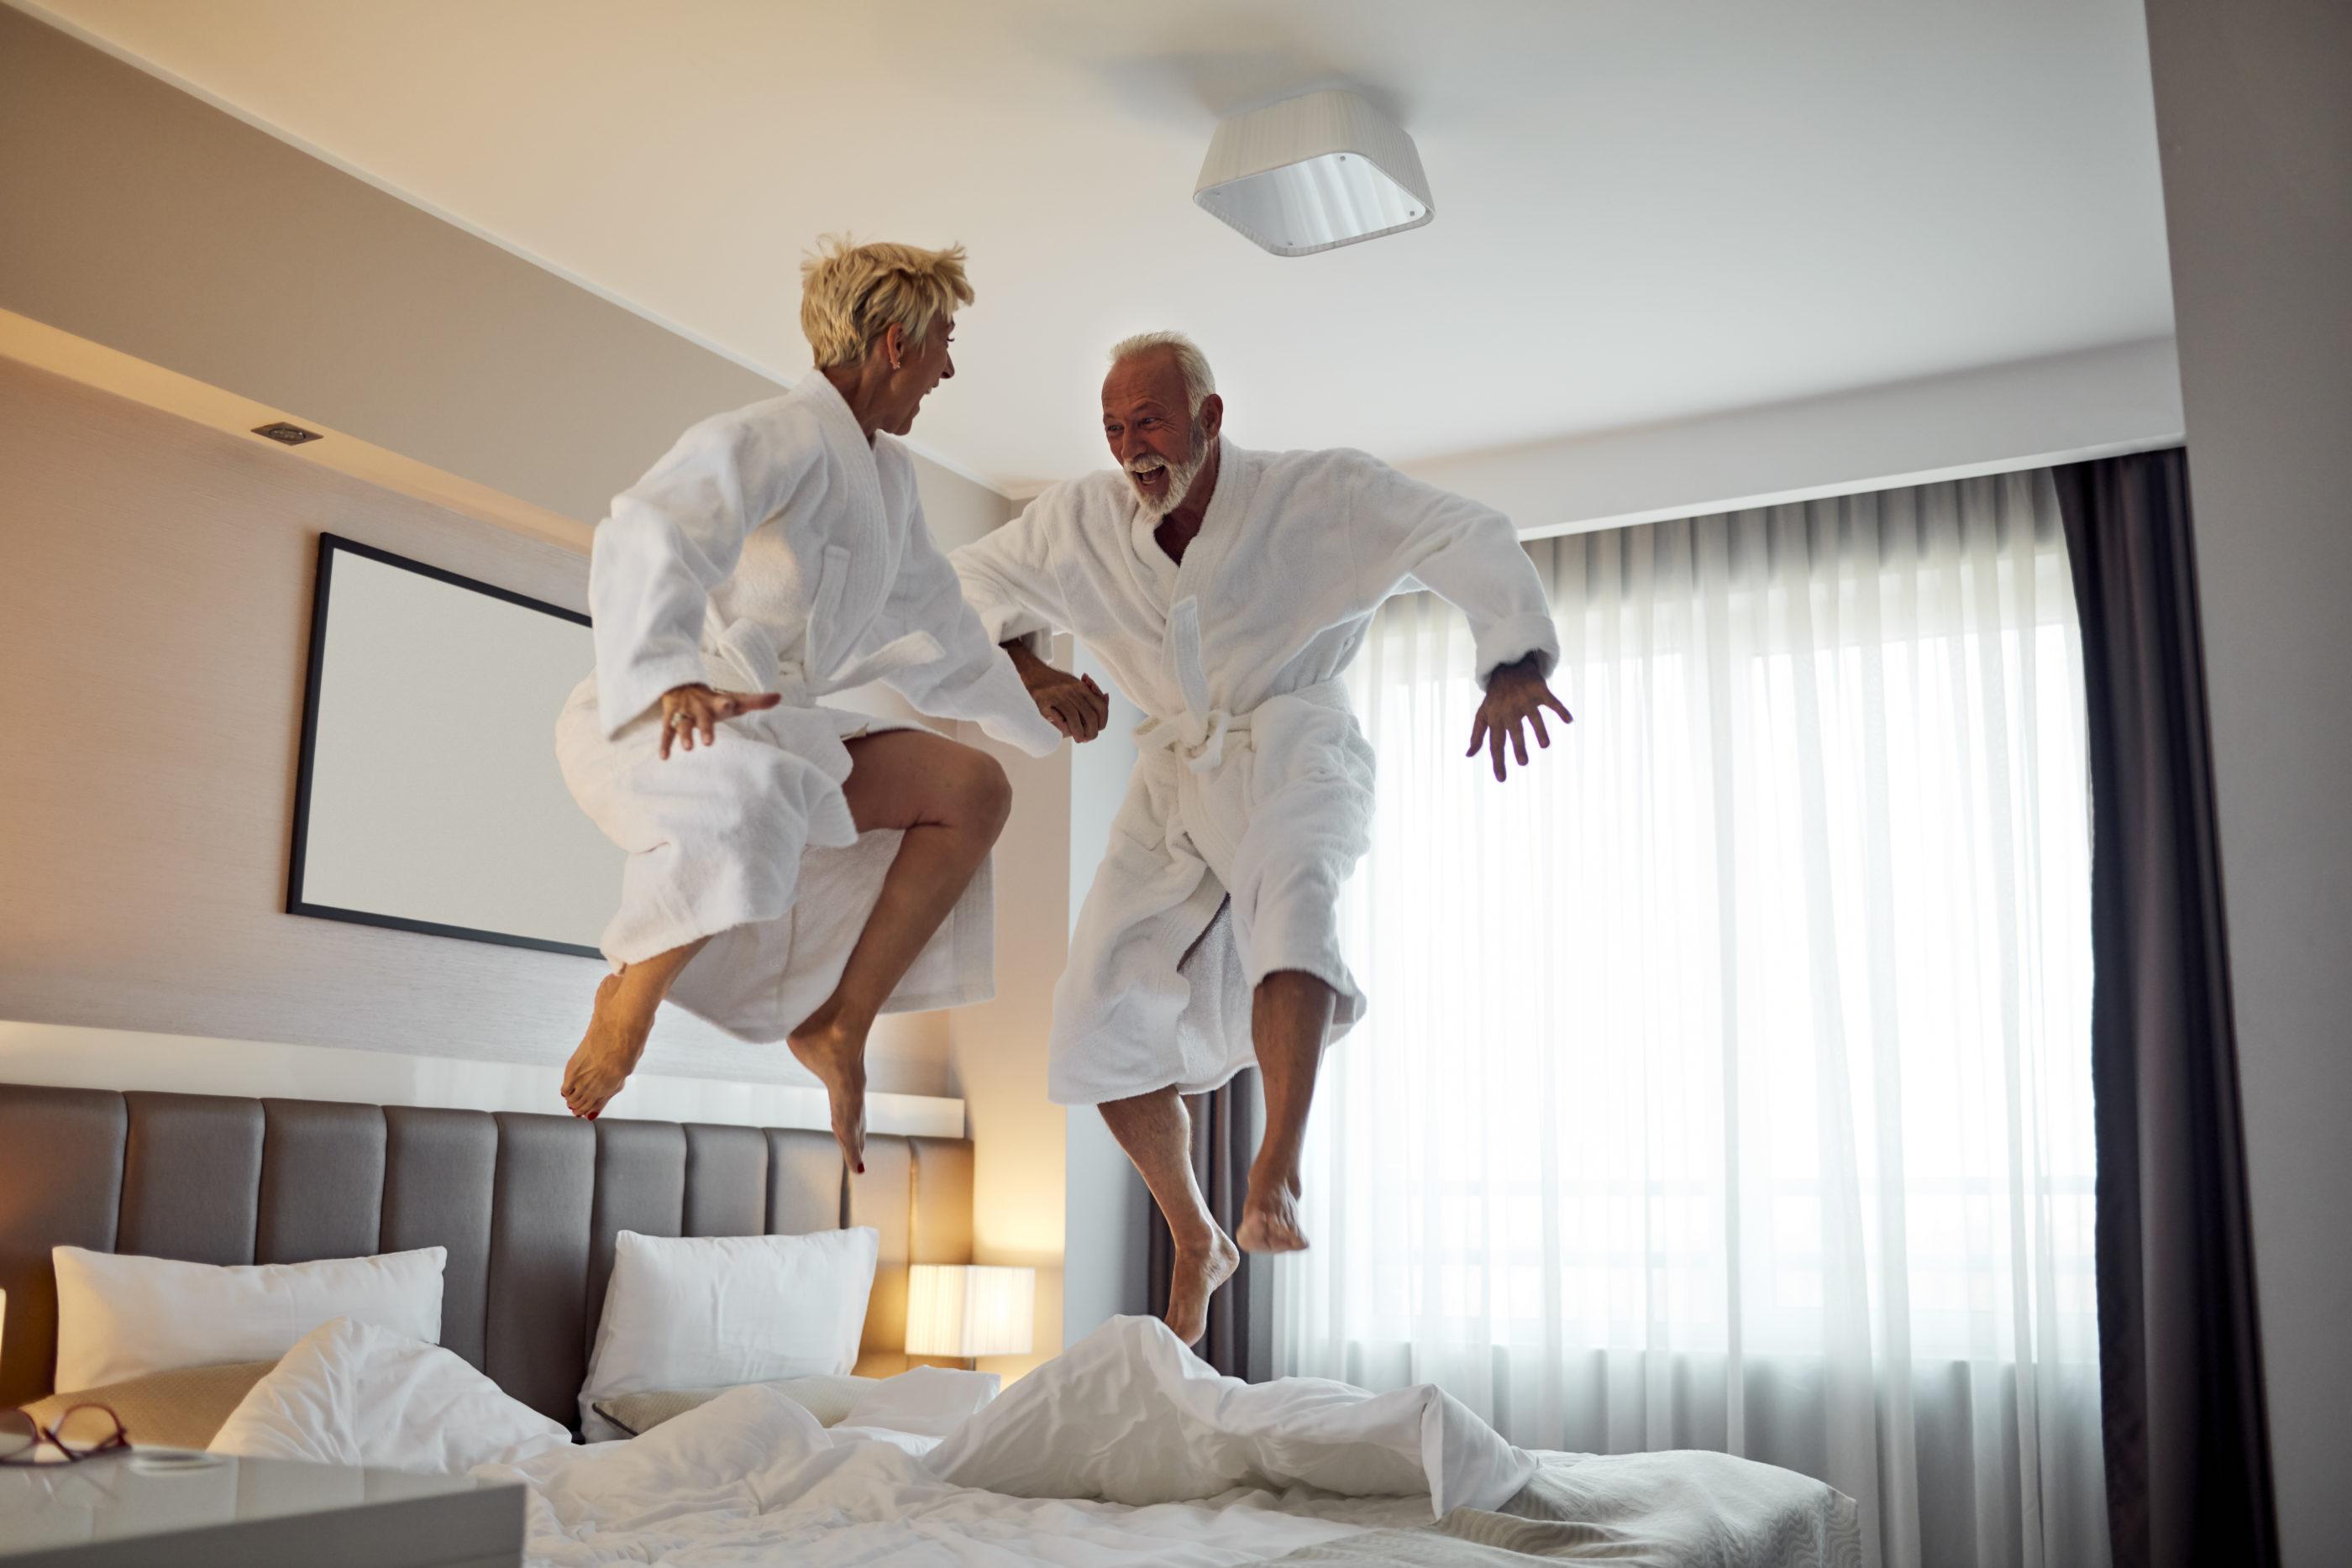 Having enjoyment at the hotel room